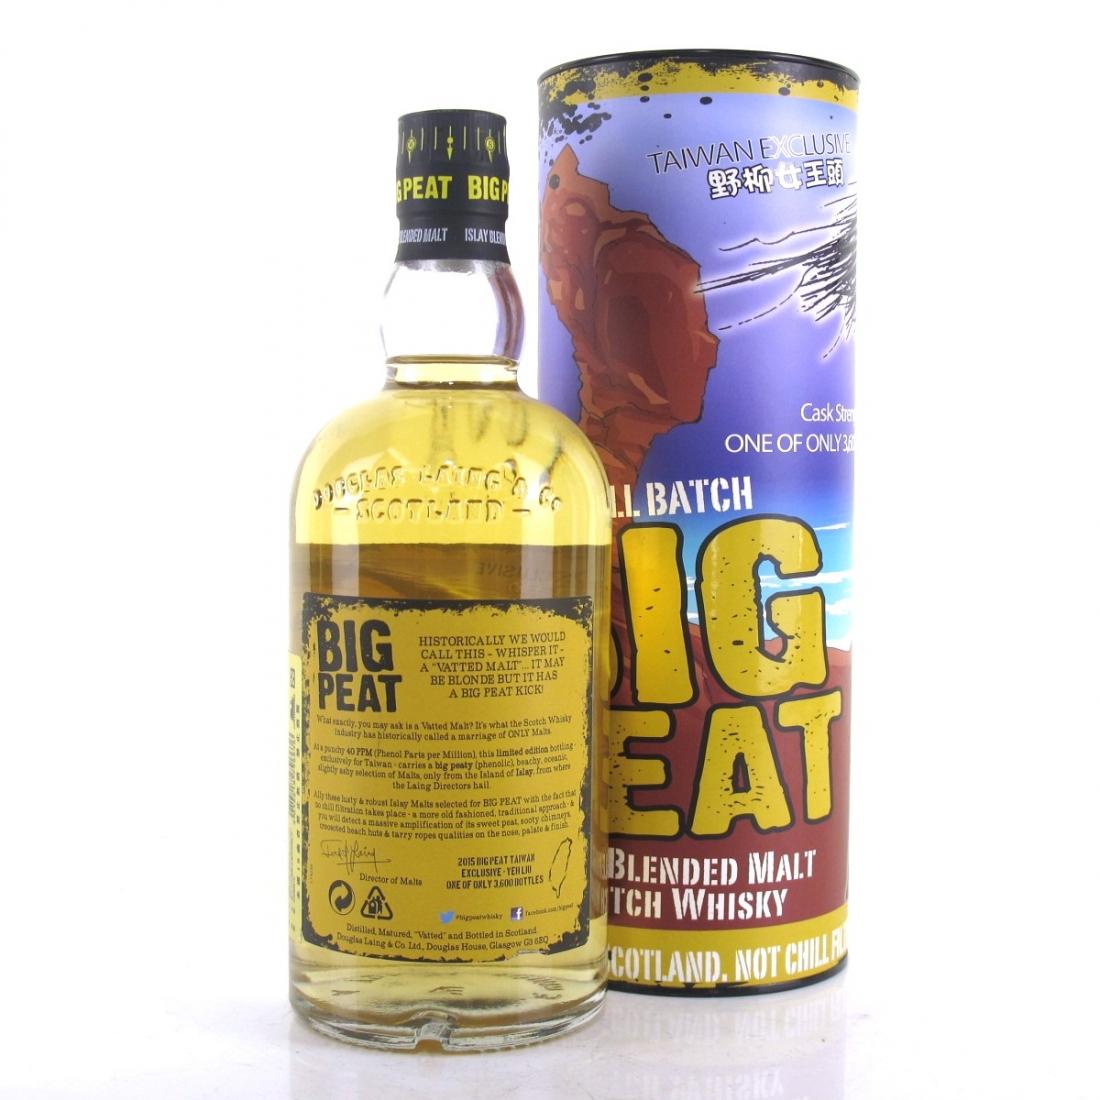 Big Peat Cask Strength Taiwan Exclusive